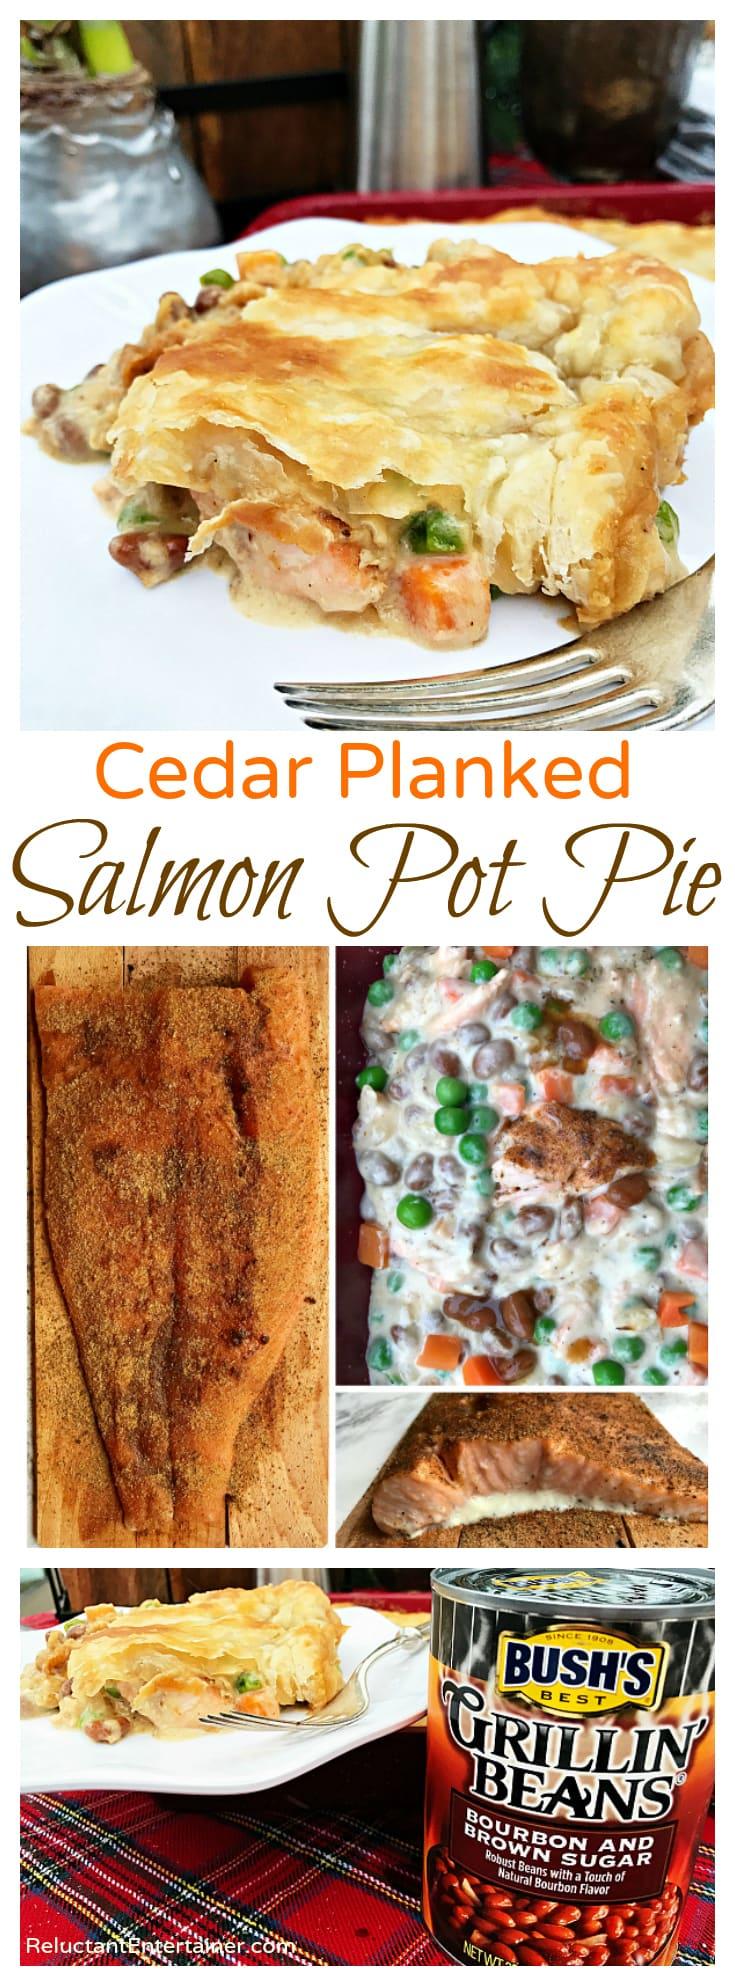 Cedar Planked Salmon Pot Pie